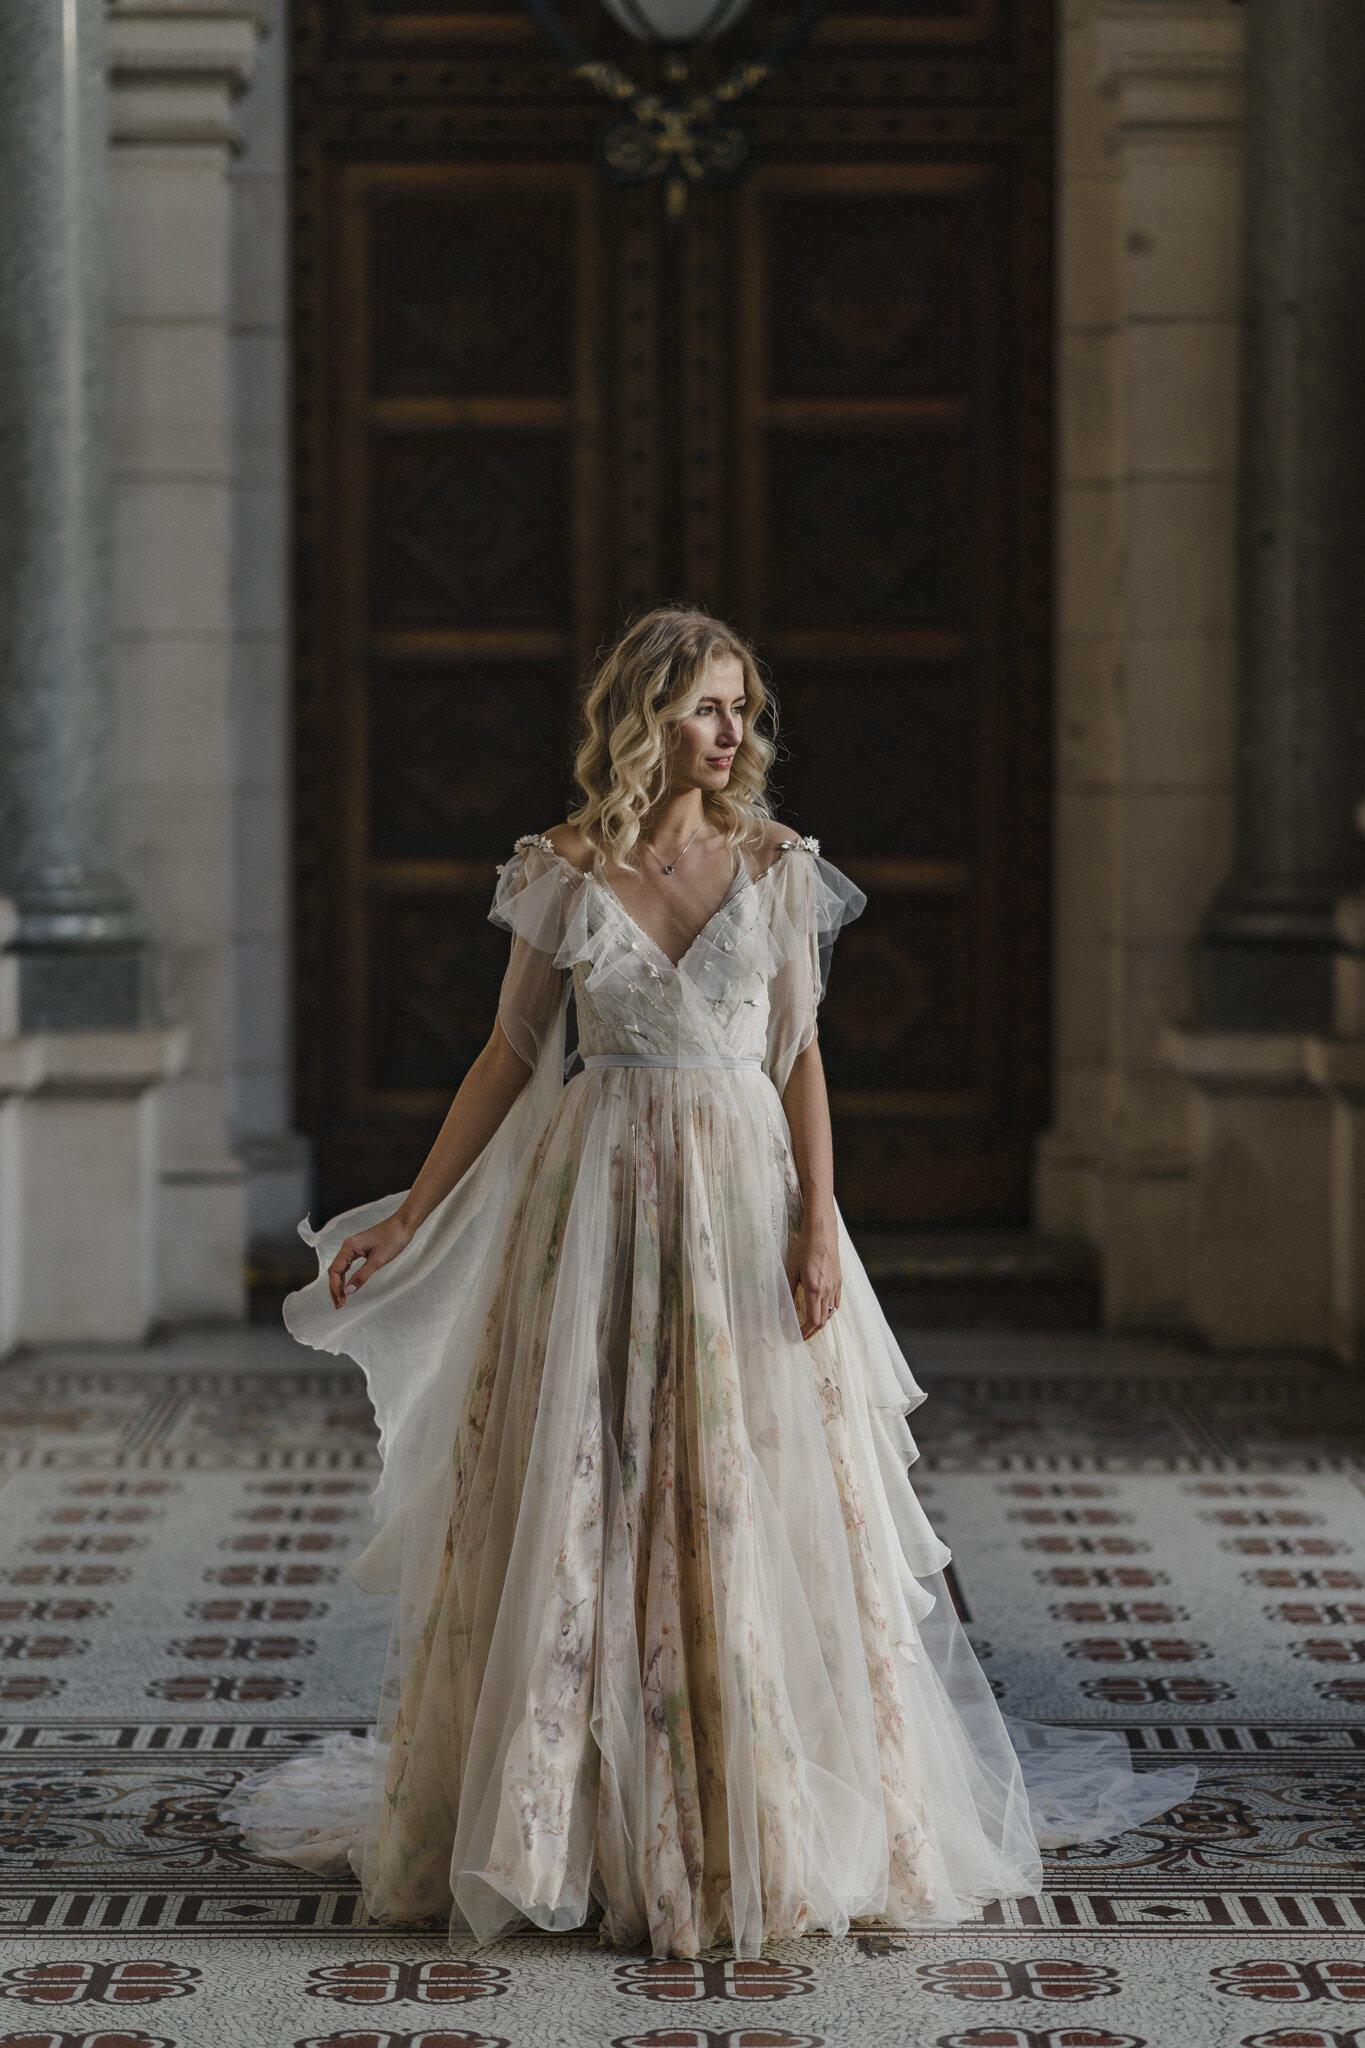 Corey Wright Melbourne Wedding Photography_021.jpg